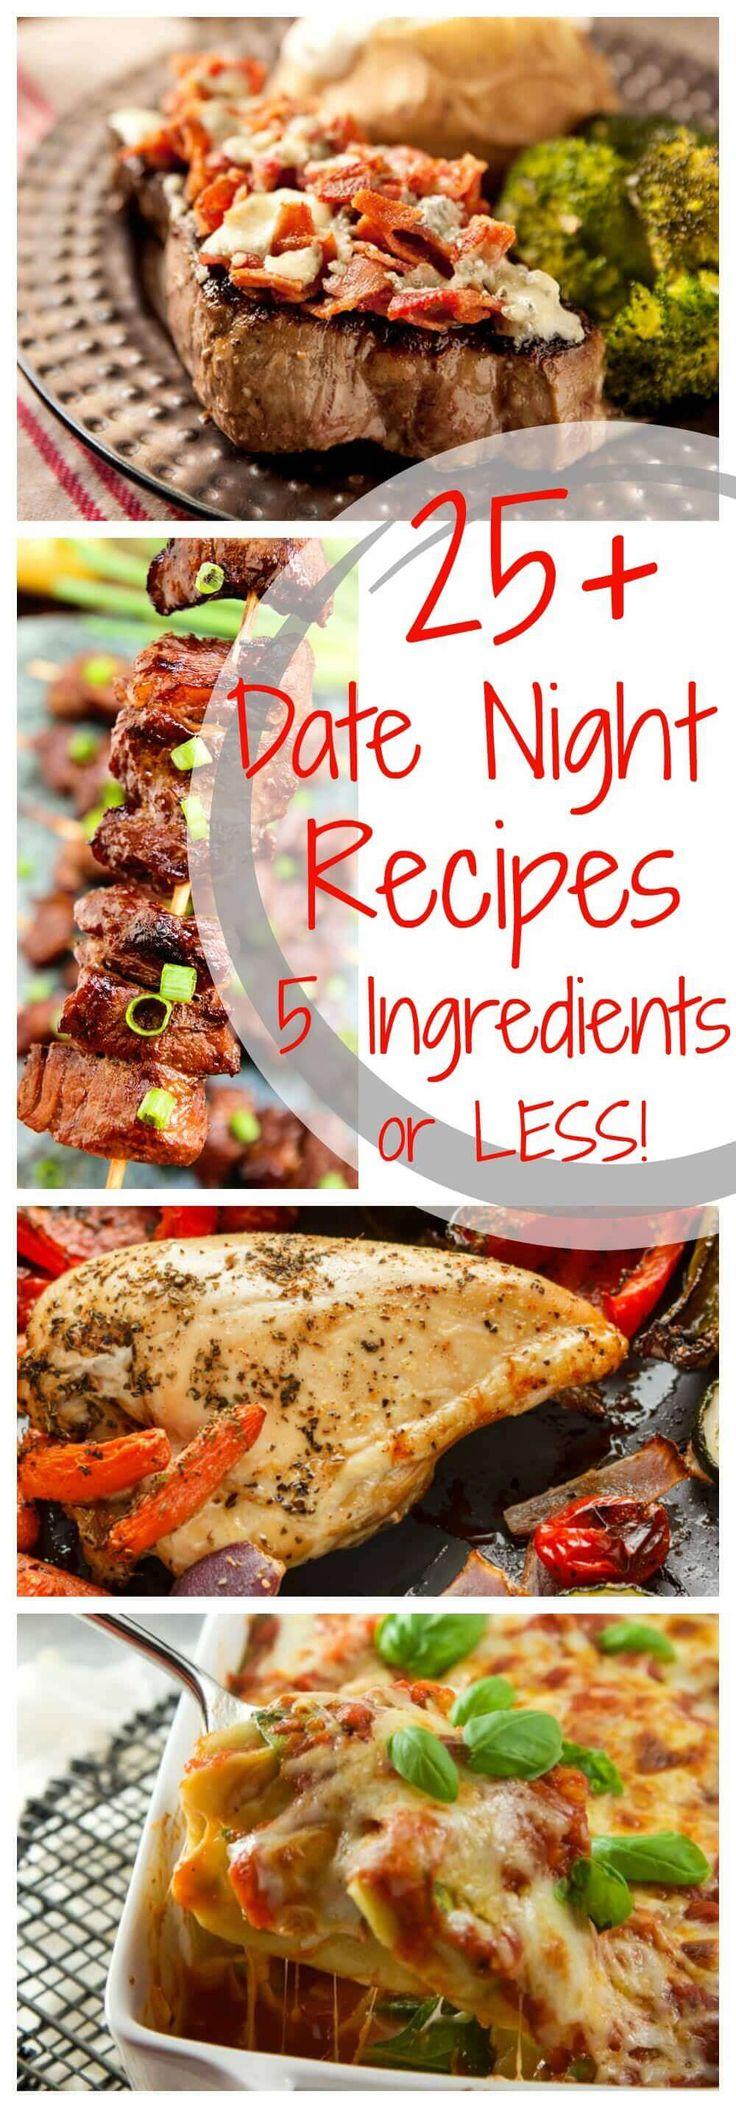 Date night dinner ideas in Melbourne